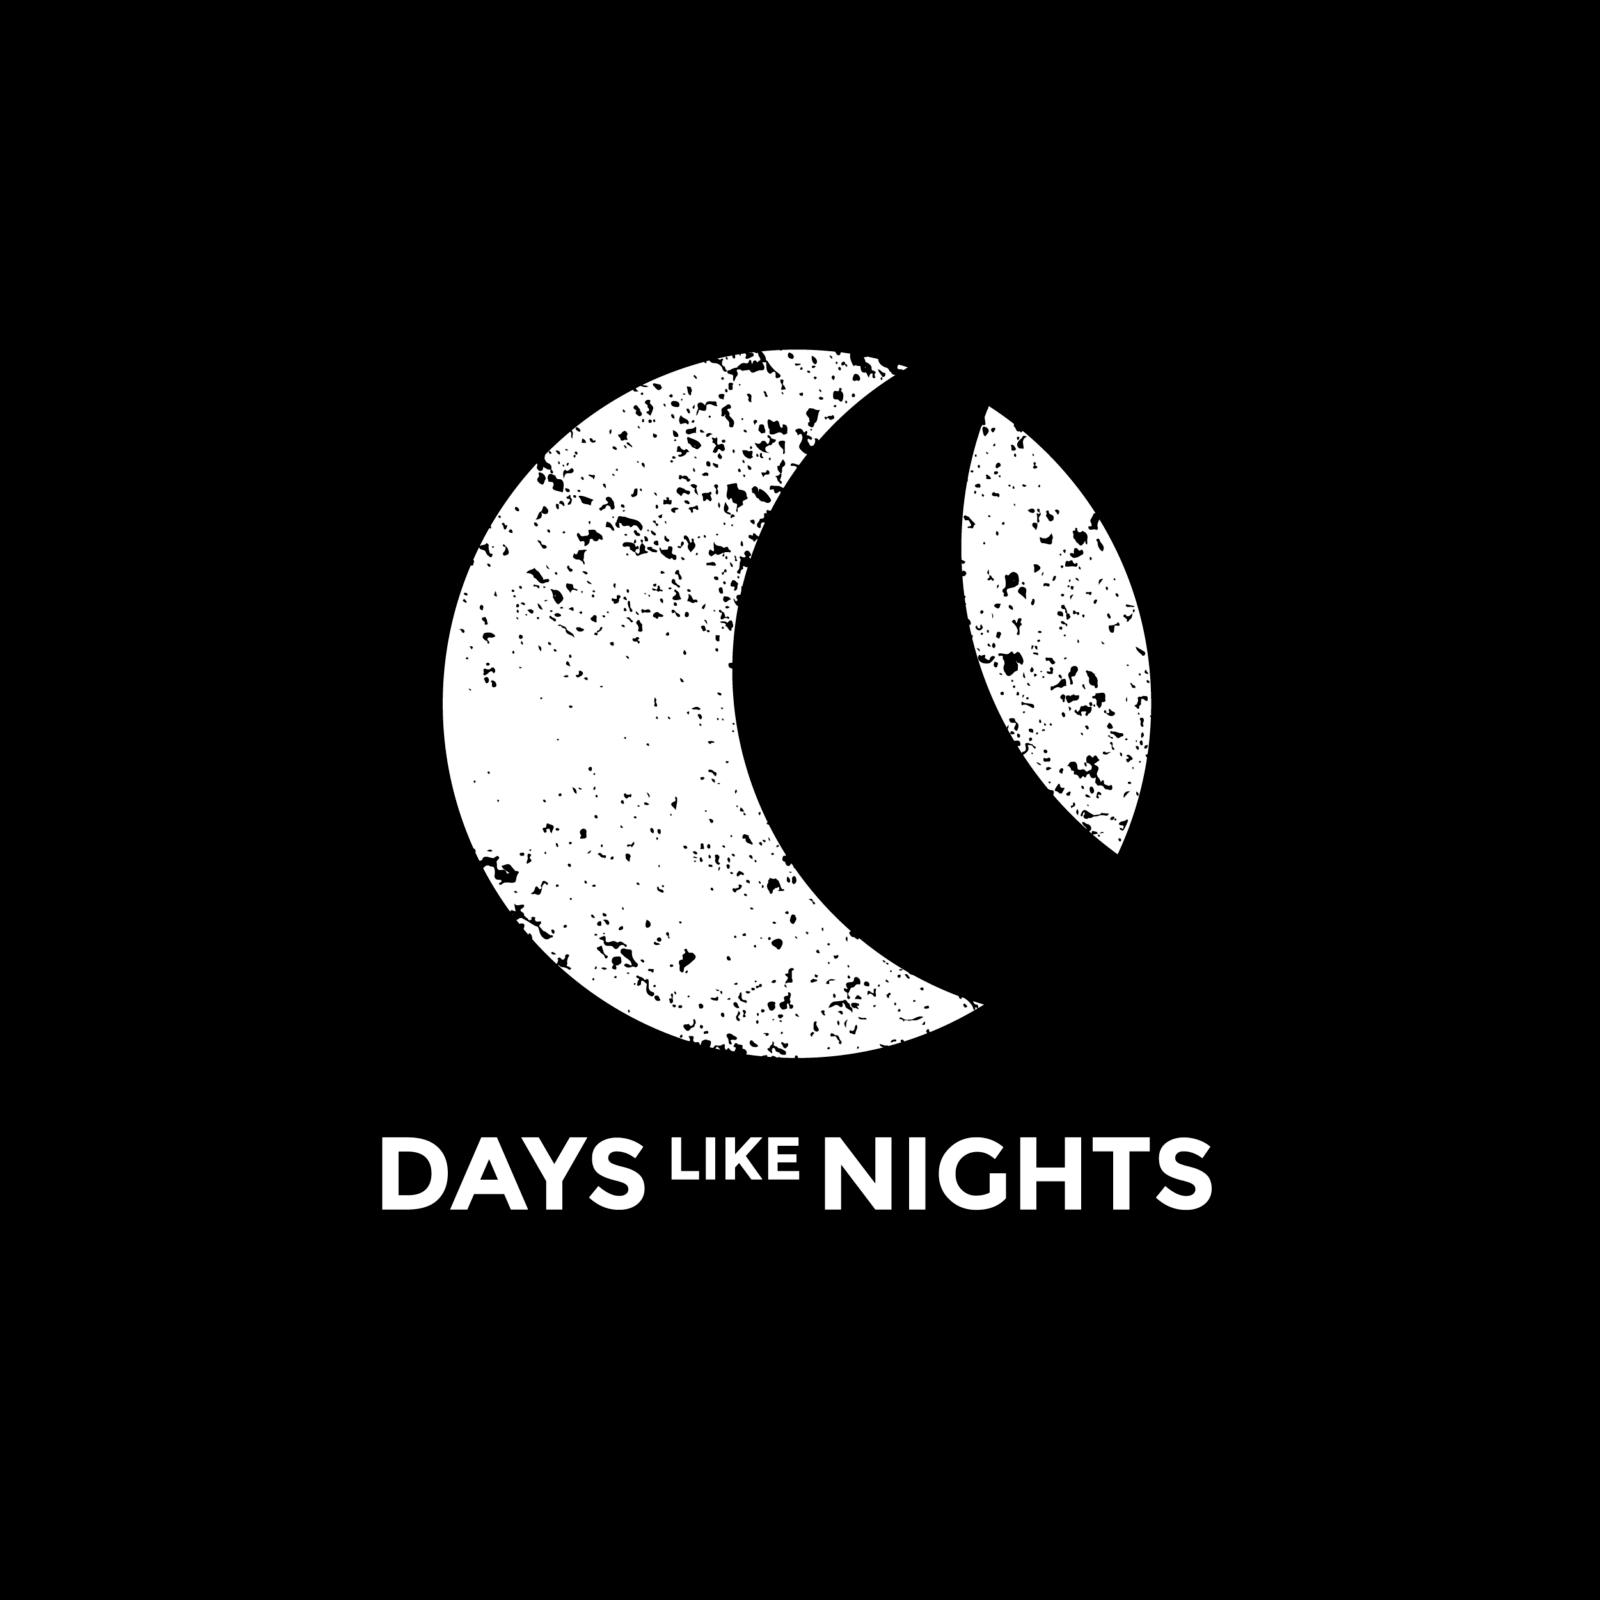 DAYS like NIGHTS